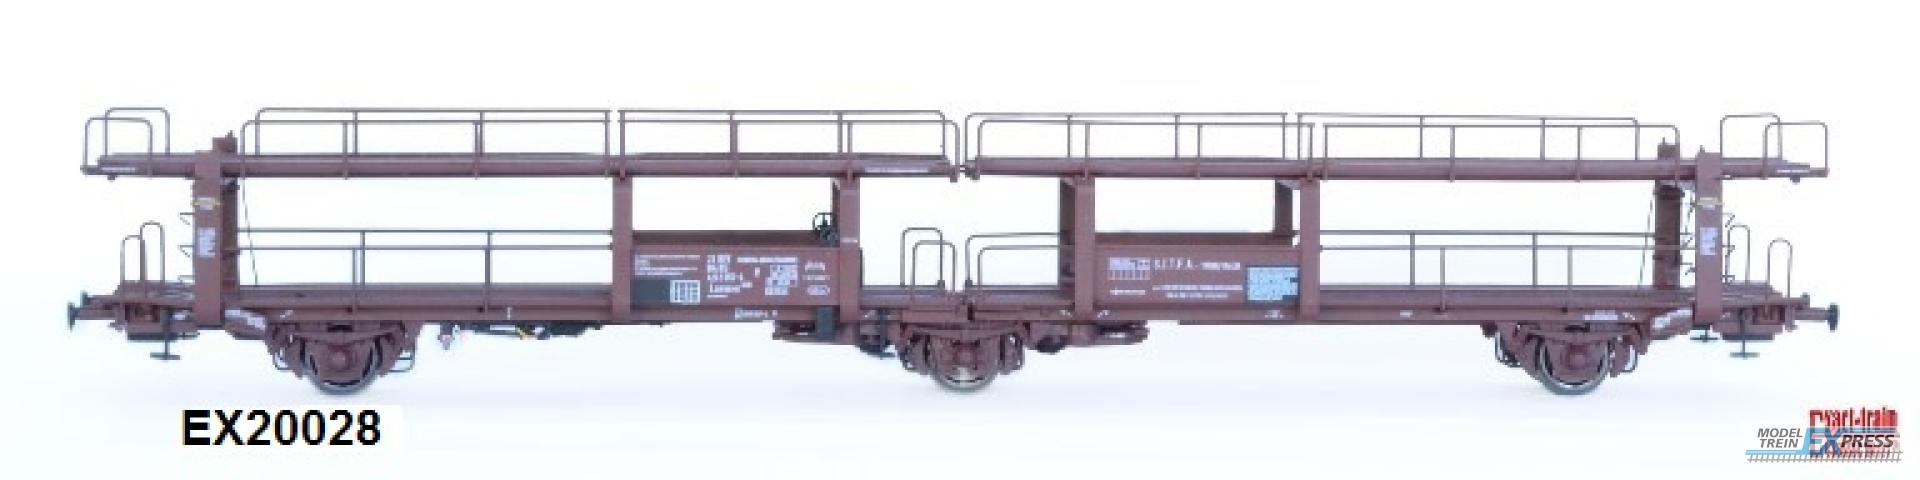 Exact-train 20028